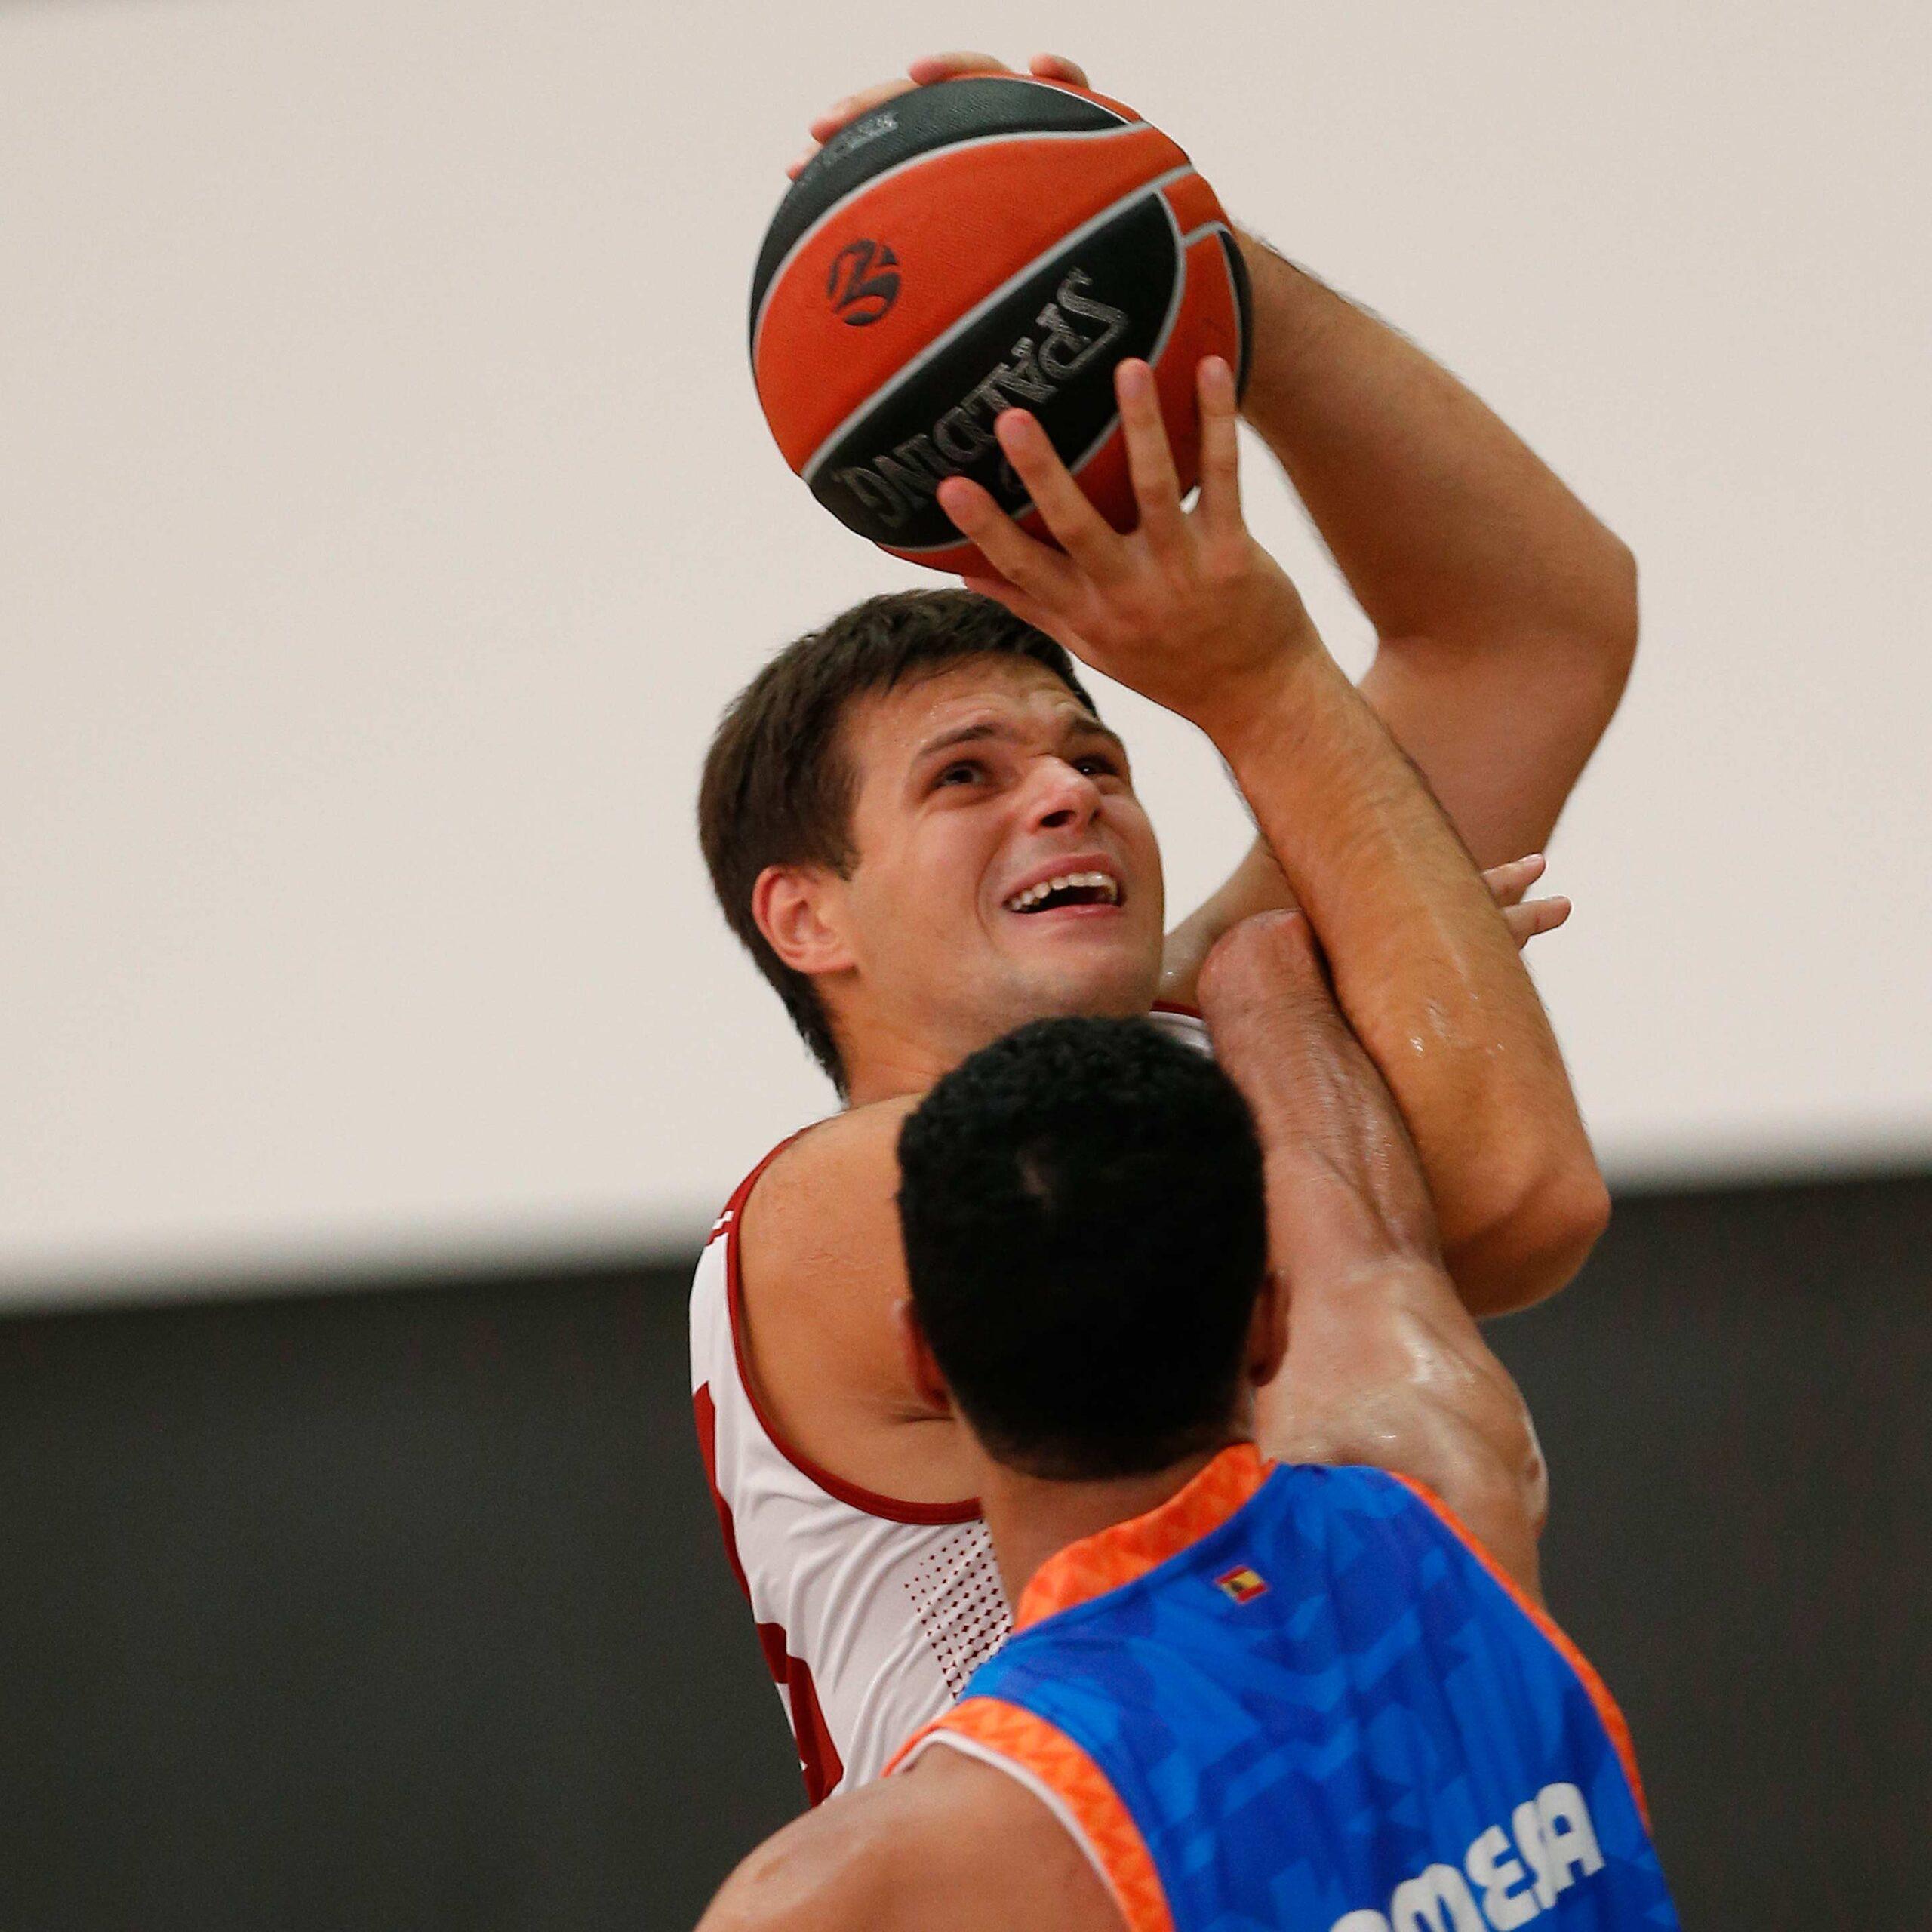 Gheorghe Rebeja Basketball